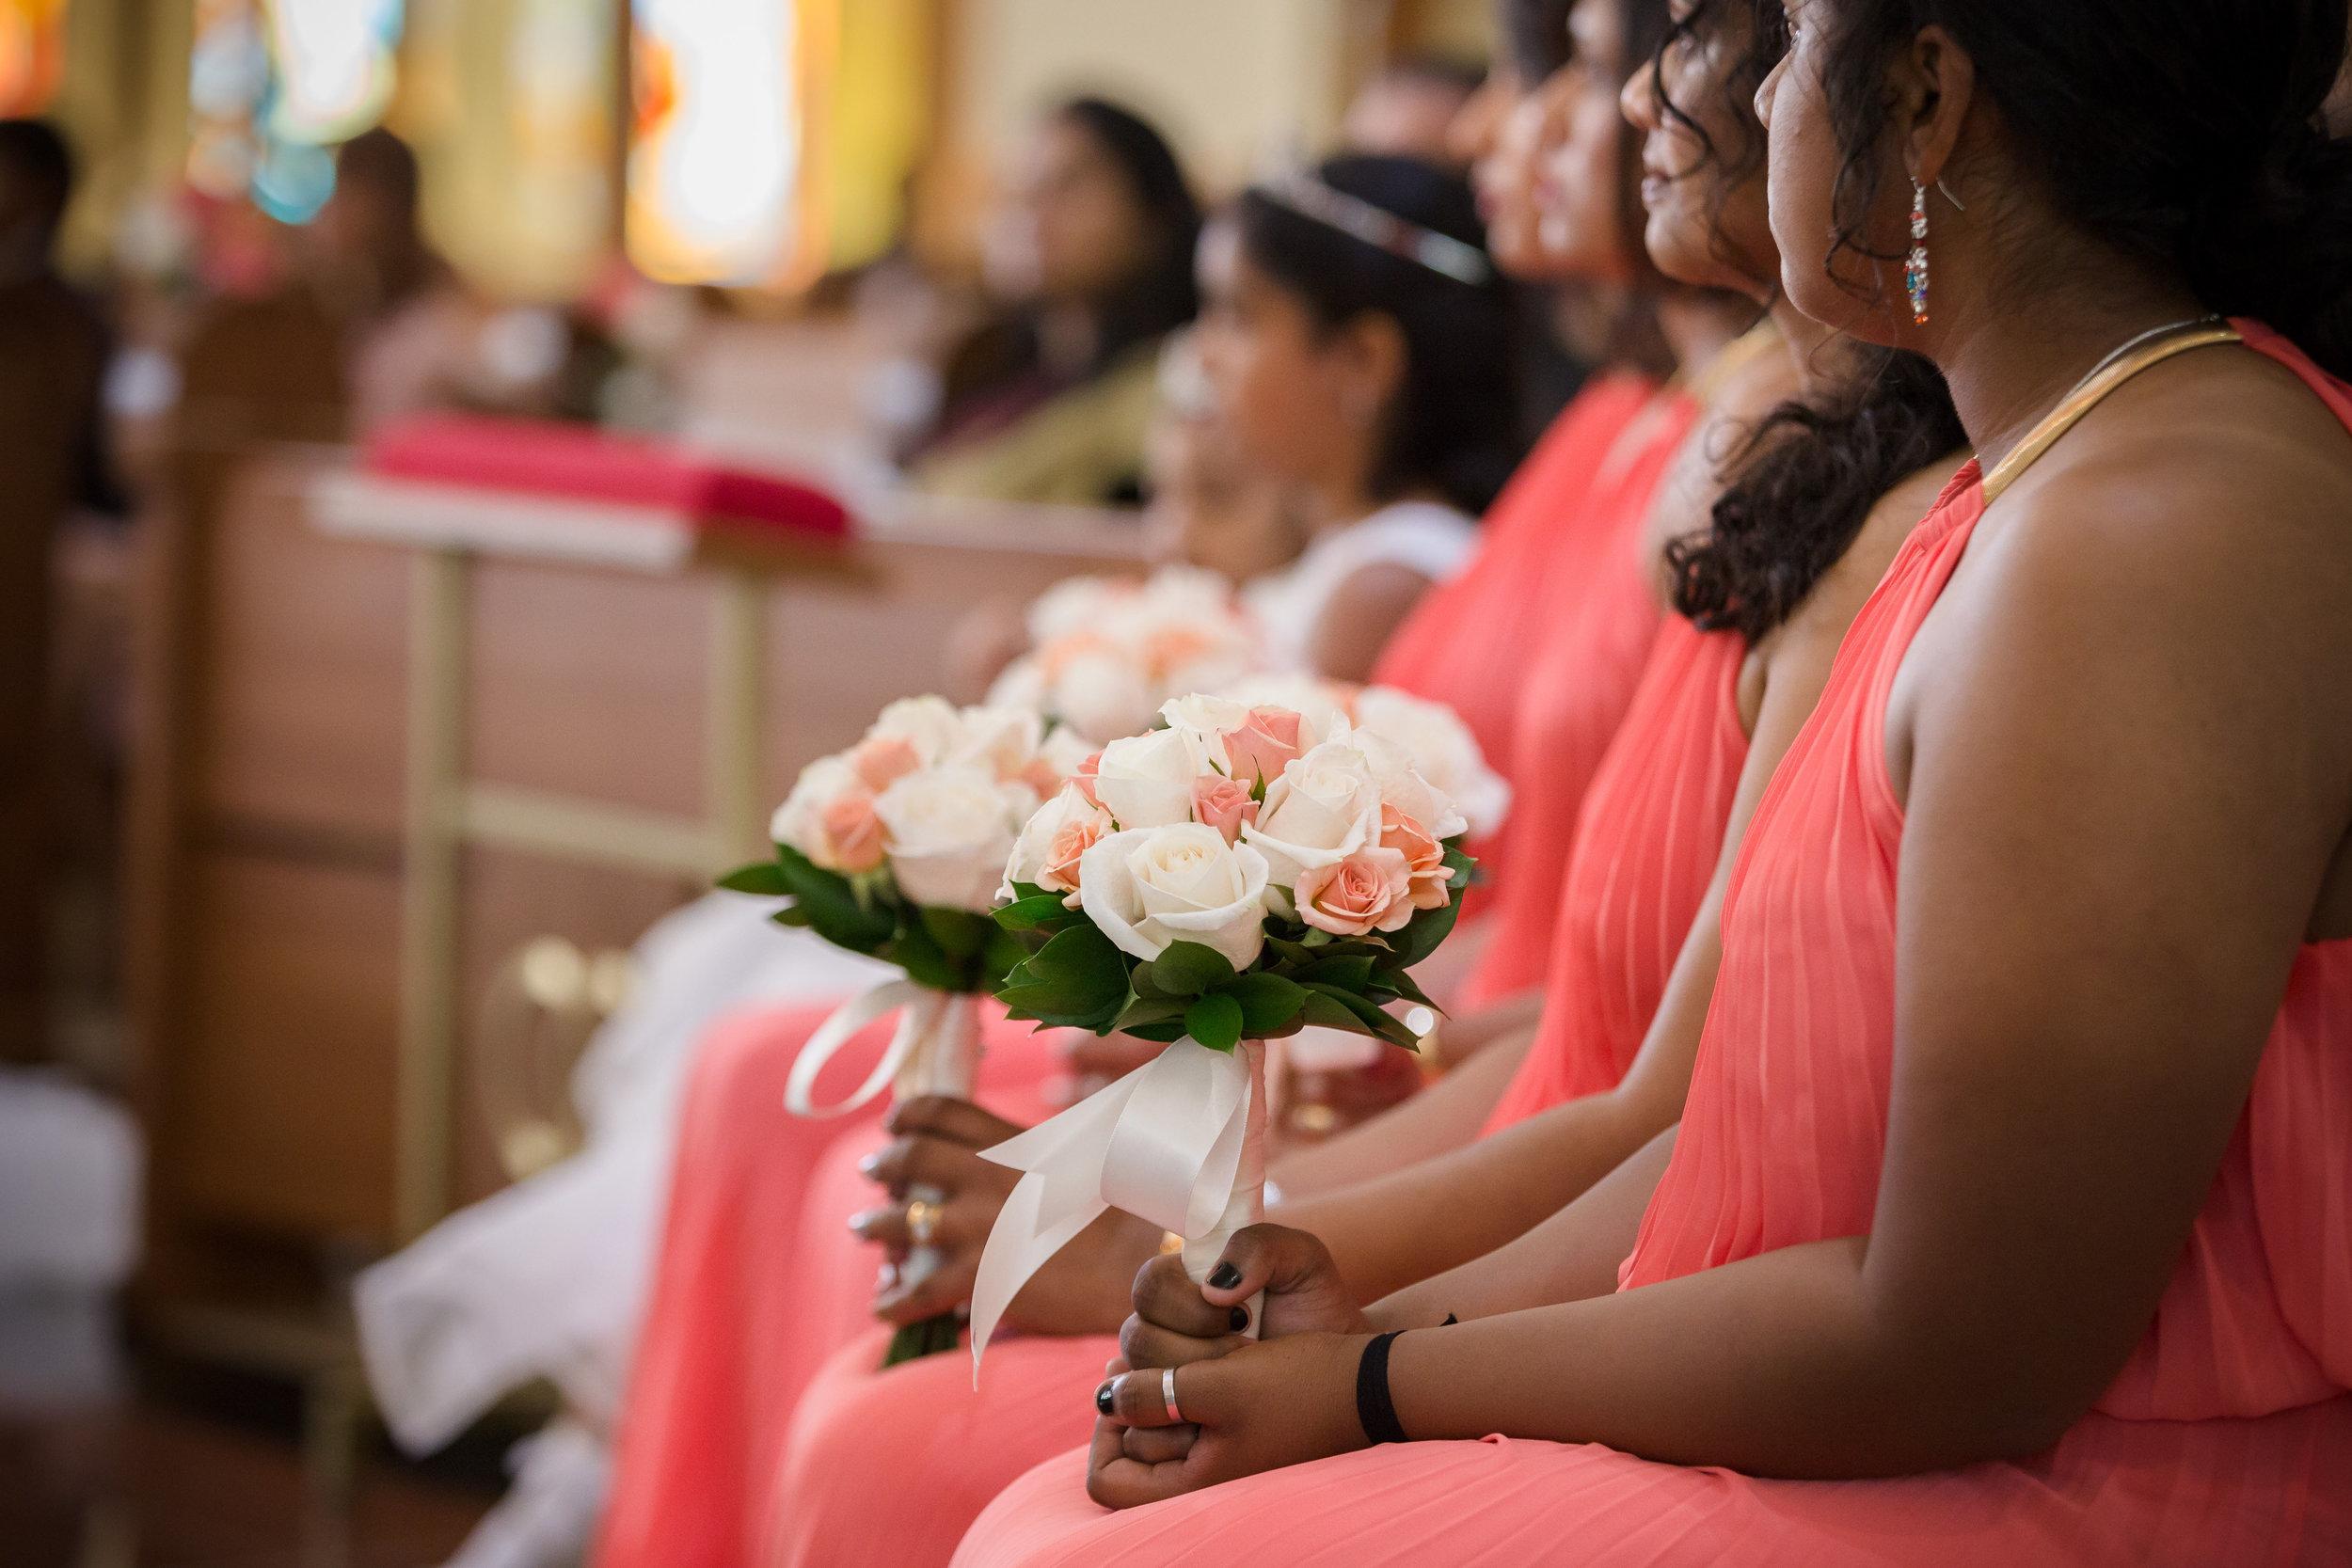 JVaughn_Photography_Weddings_Huntley_Photographer_Professional_Wedding0362.jpg